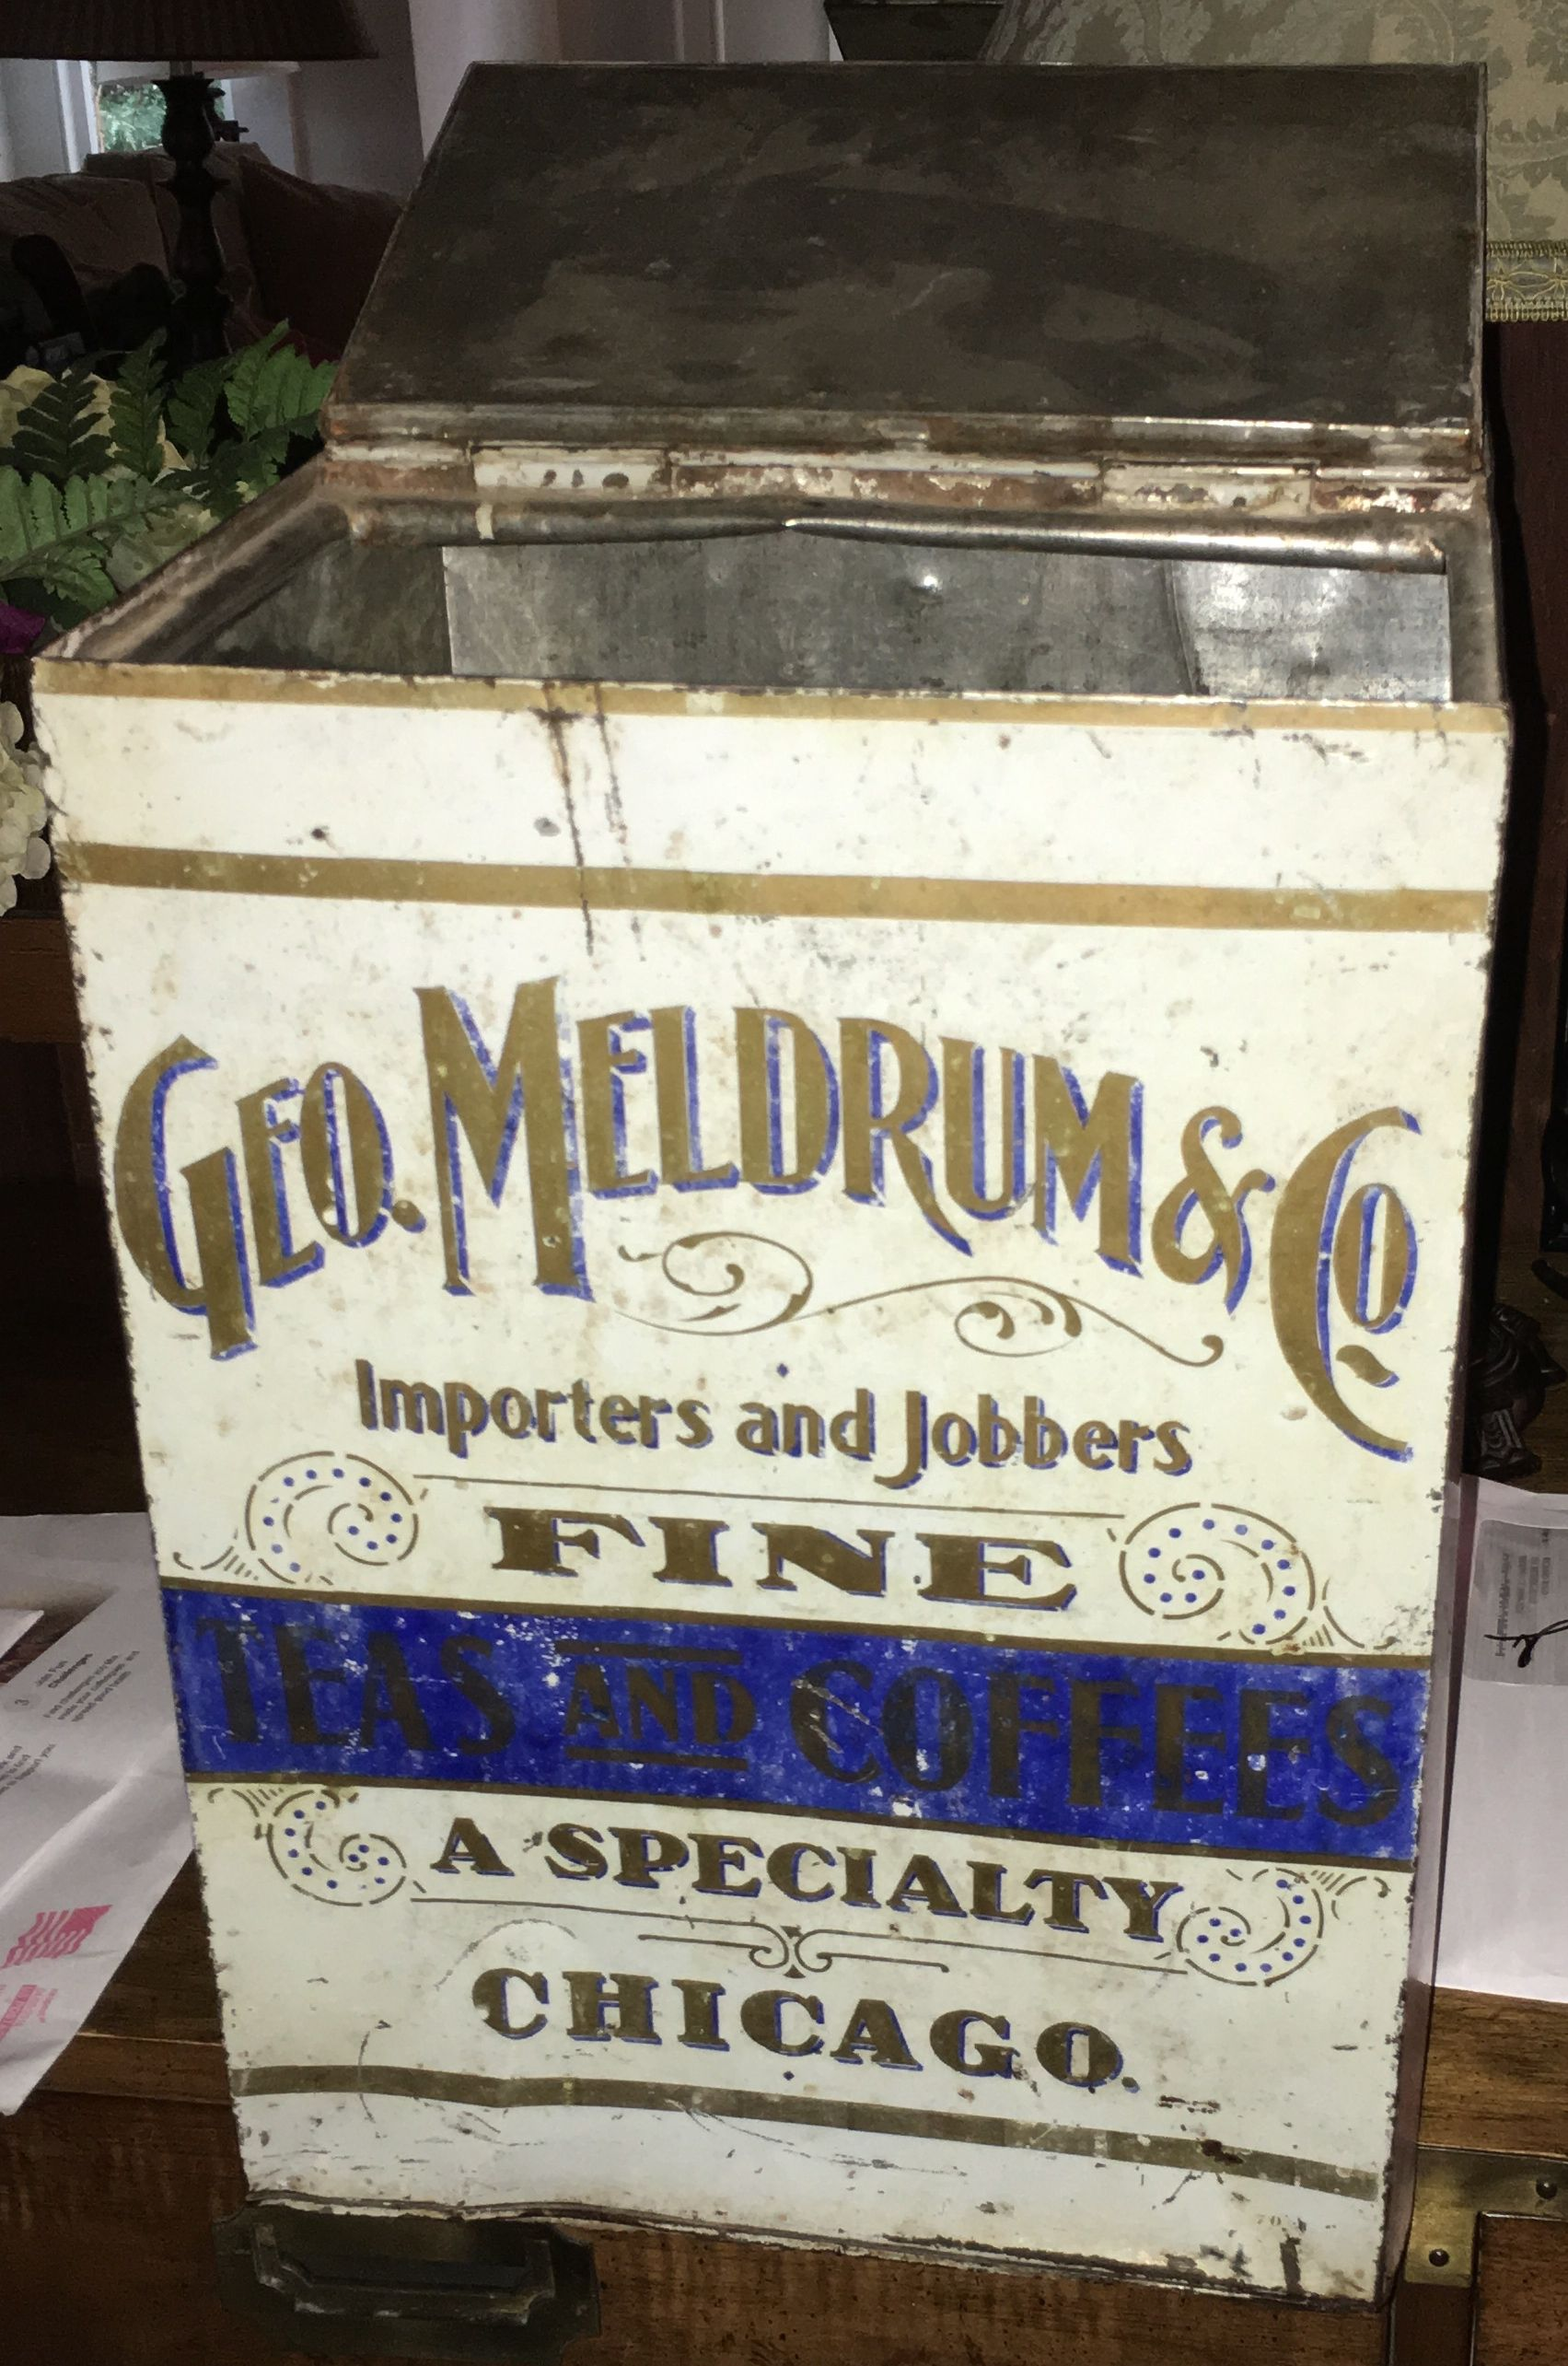 Geo. Meldrum & Co. Coffee